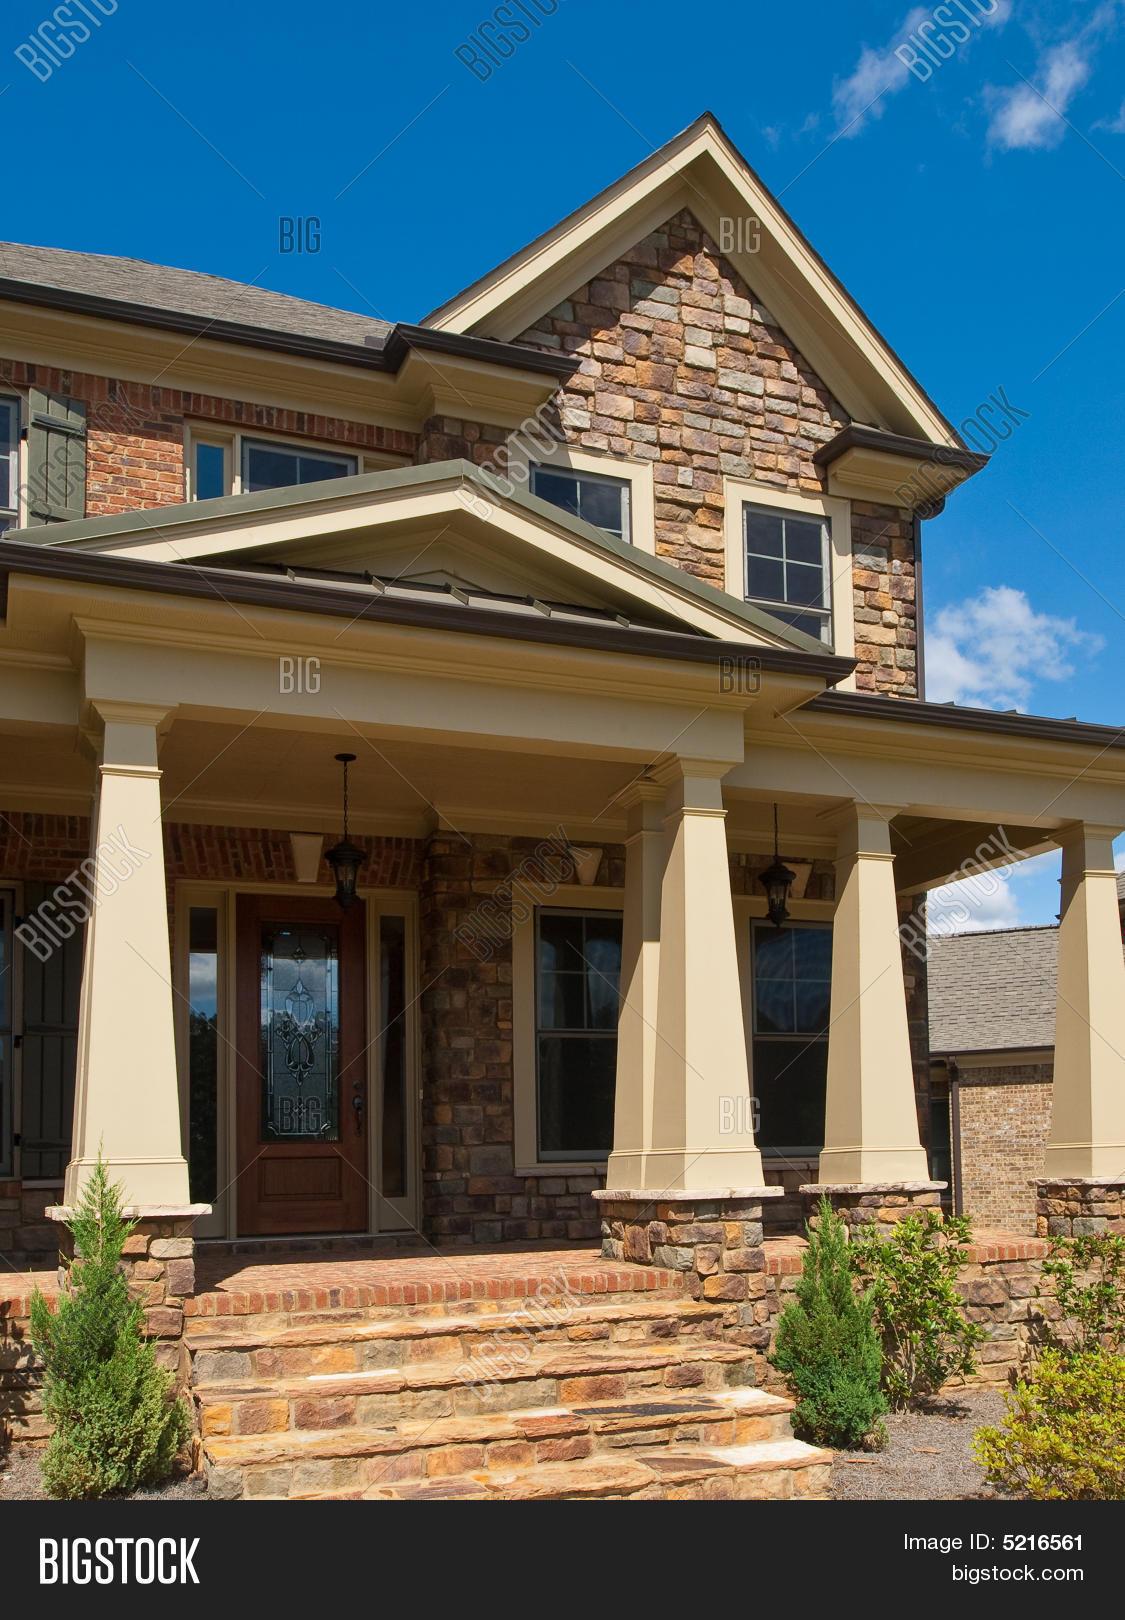 Luxury model home column exterior image photo bigstock for Luxury model homes